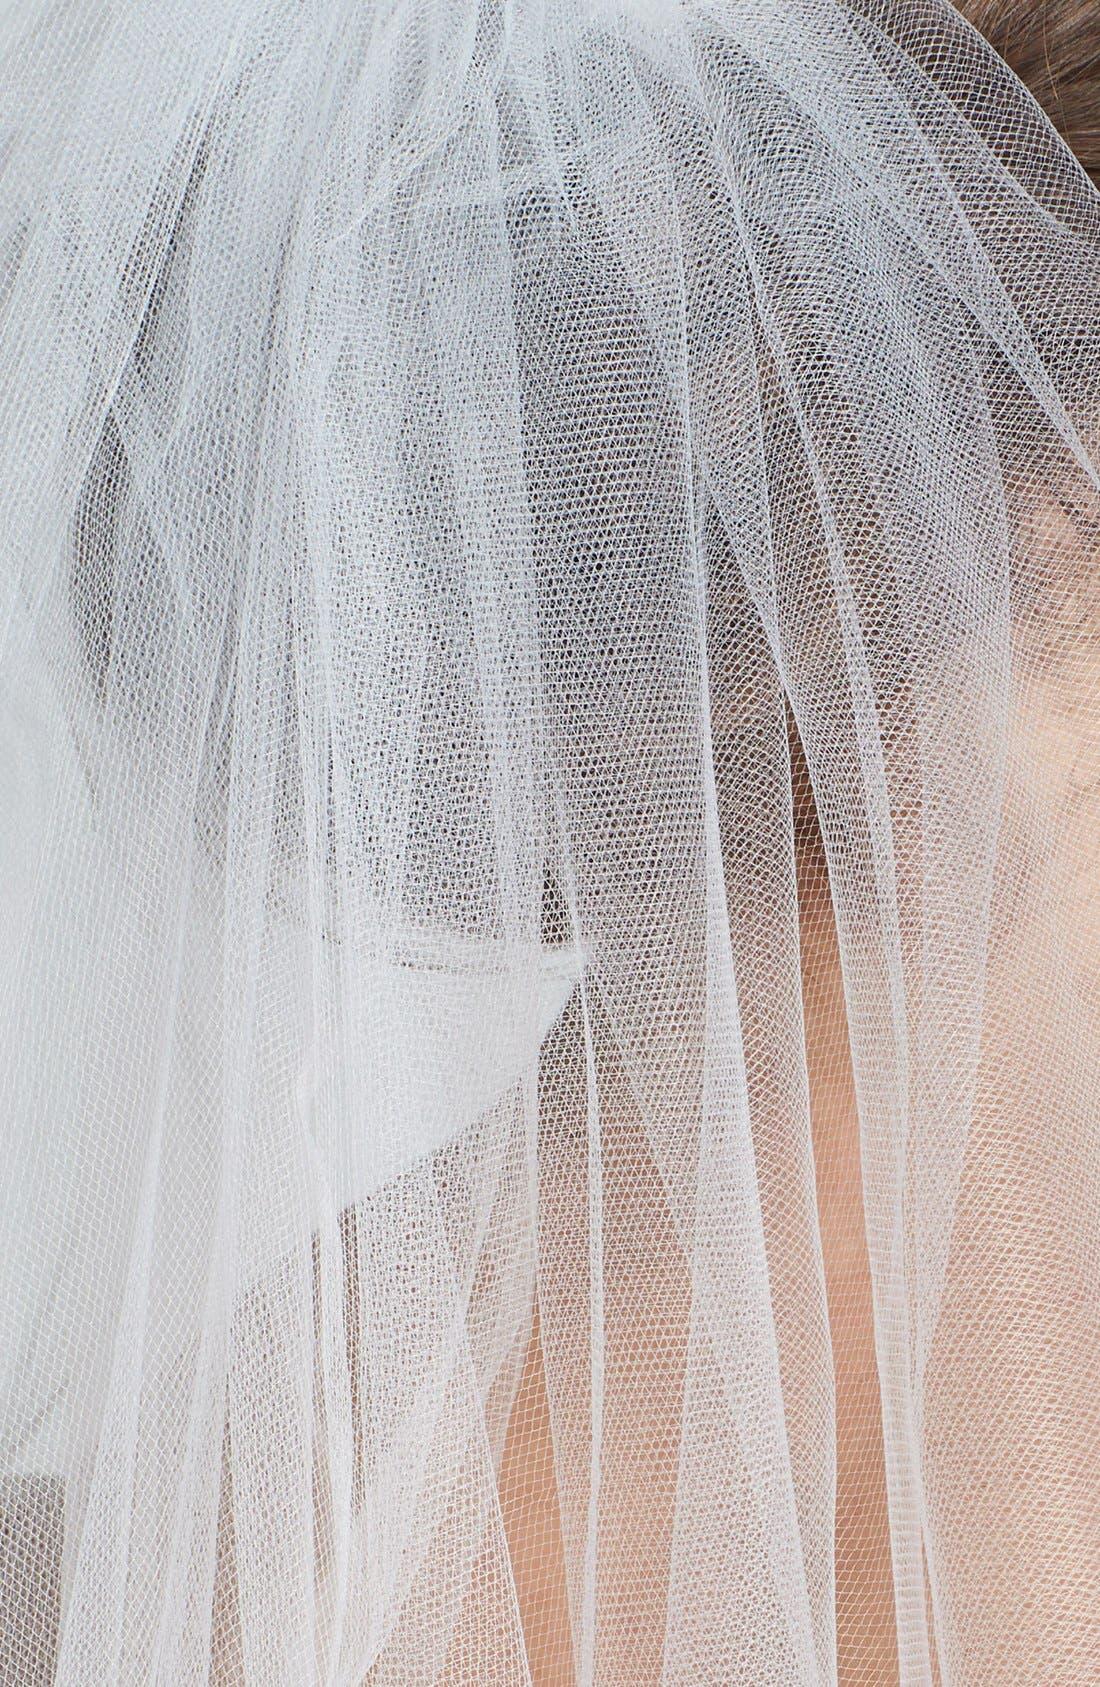 Alternate Image 2  - Wedding Belles New York 'Ellen' Cathedral Veil (Nordstrom Exclusive)